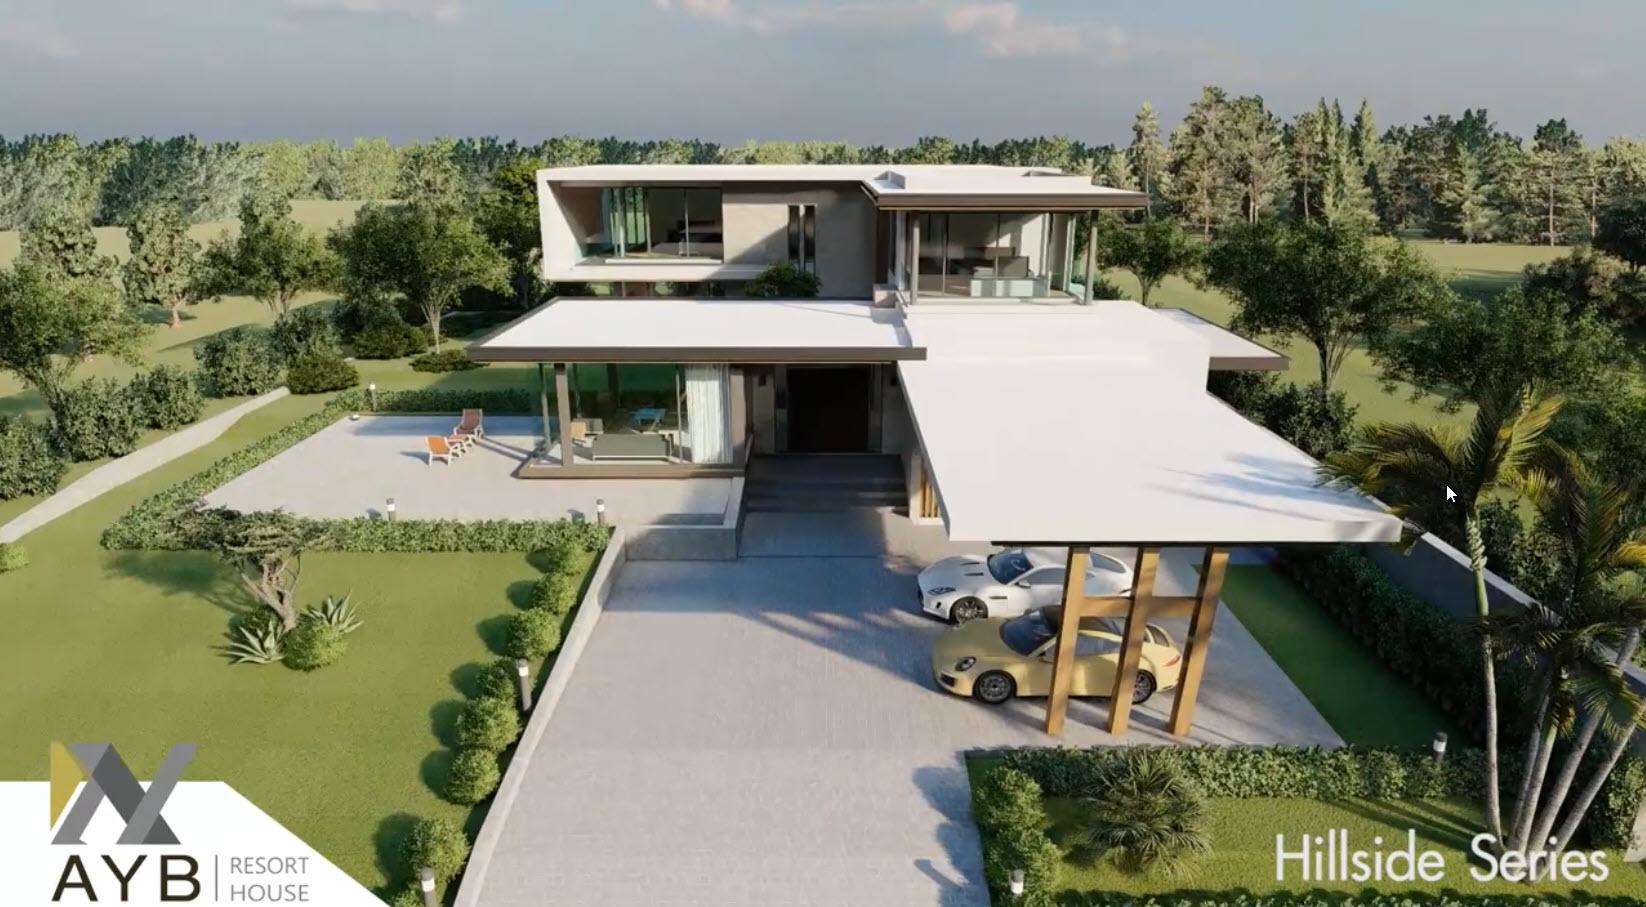 AYB Hot Deal 2020 - แบบบ้าน Hillside